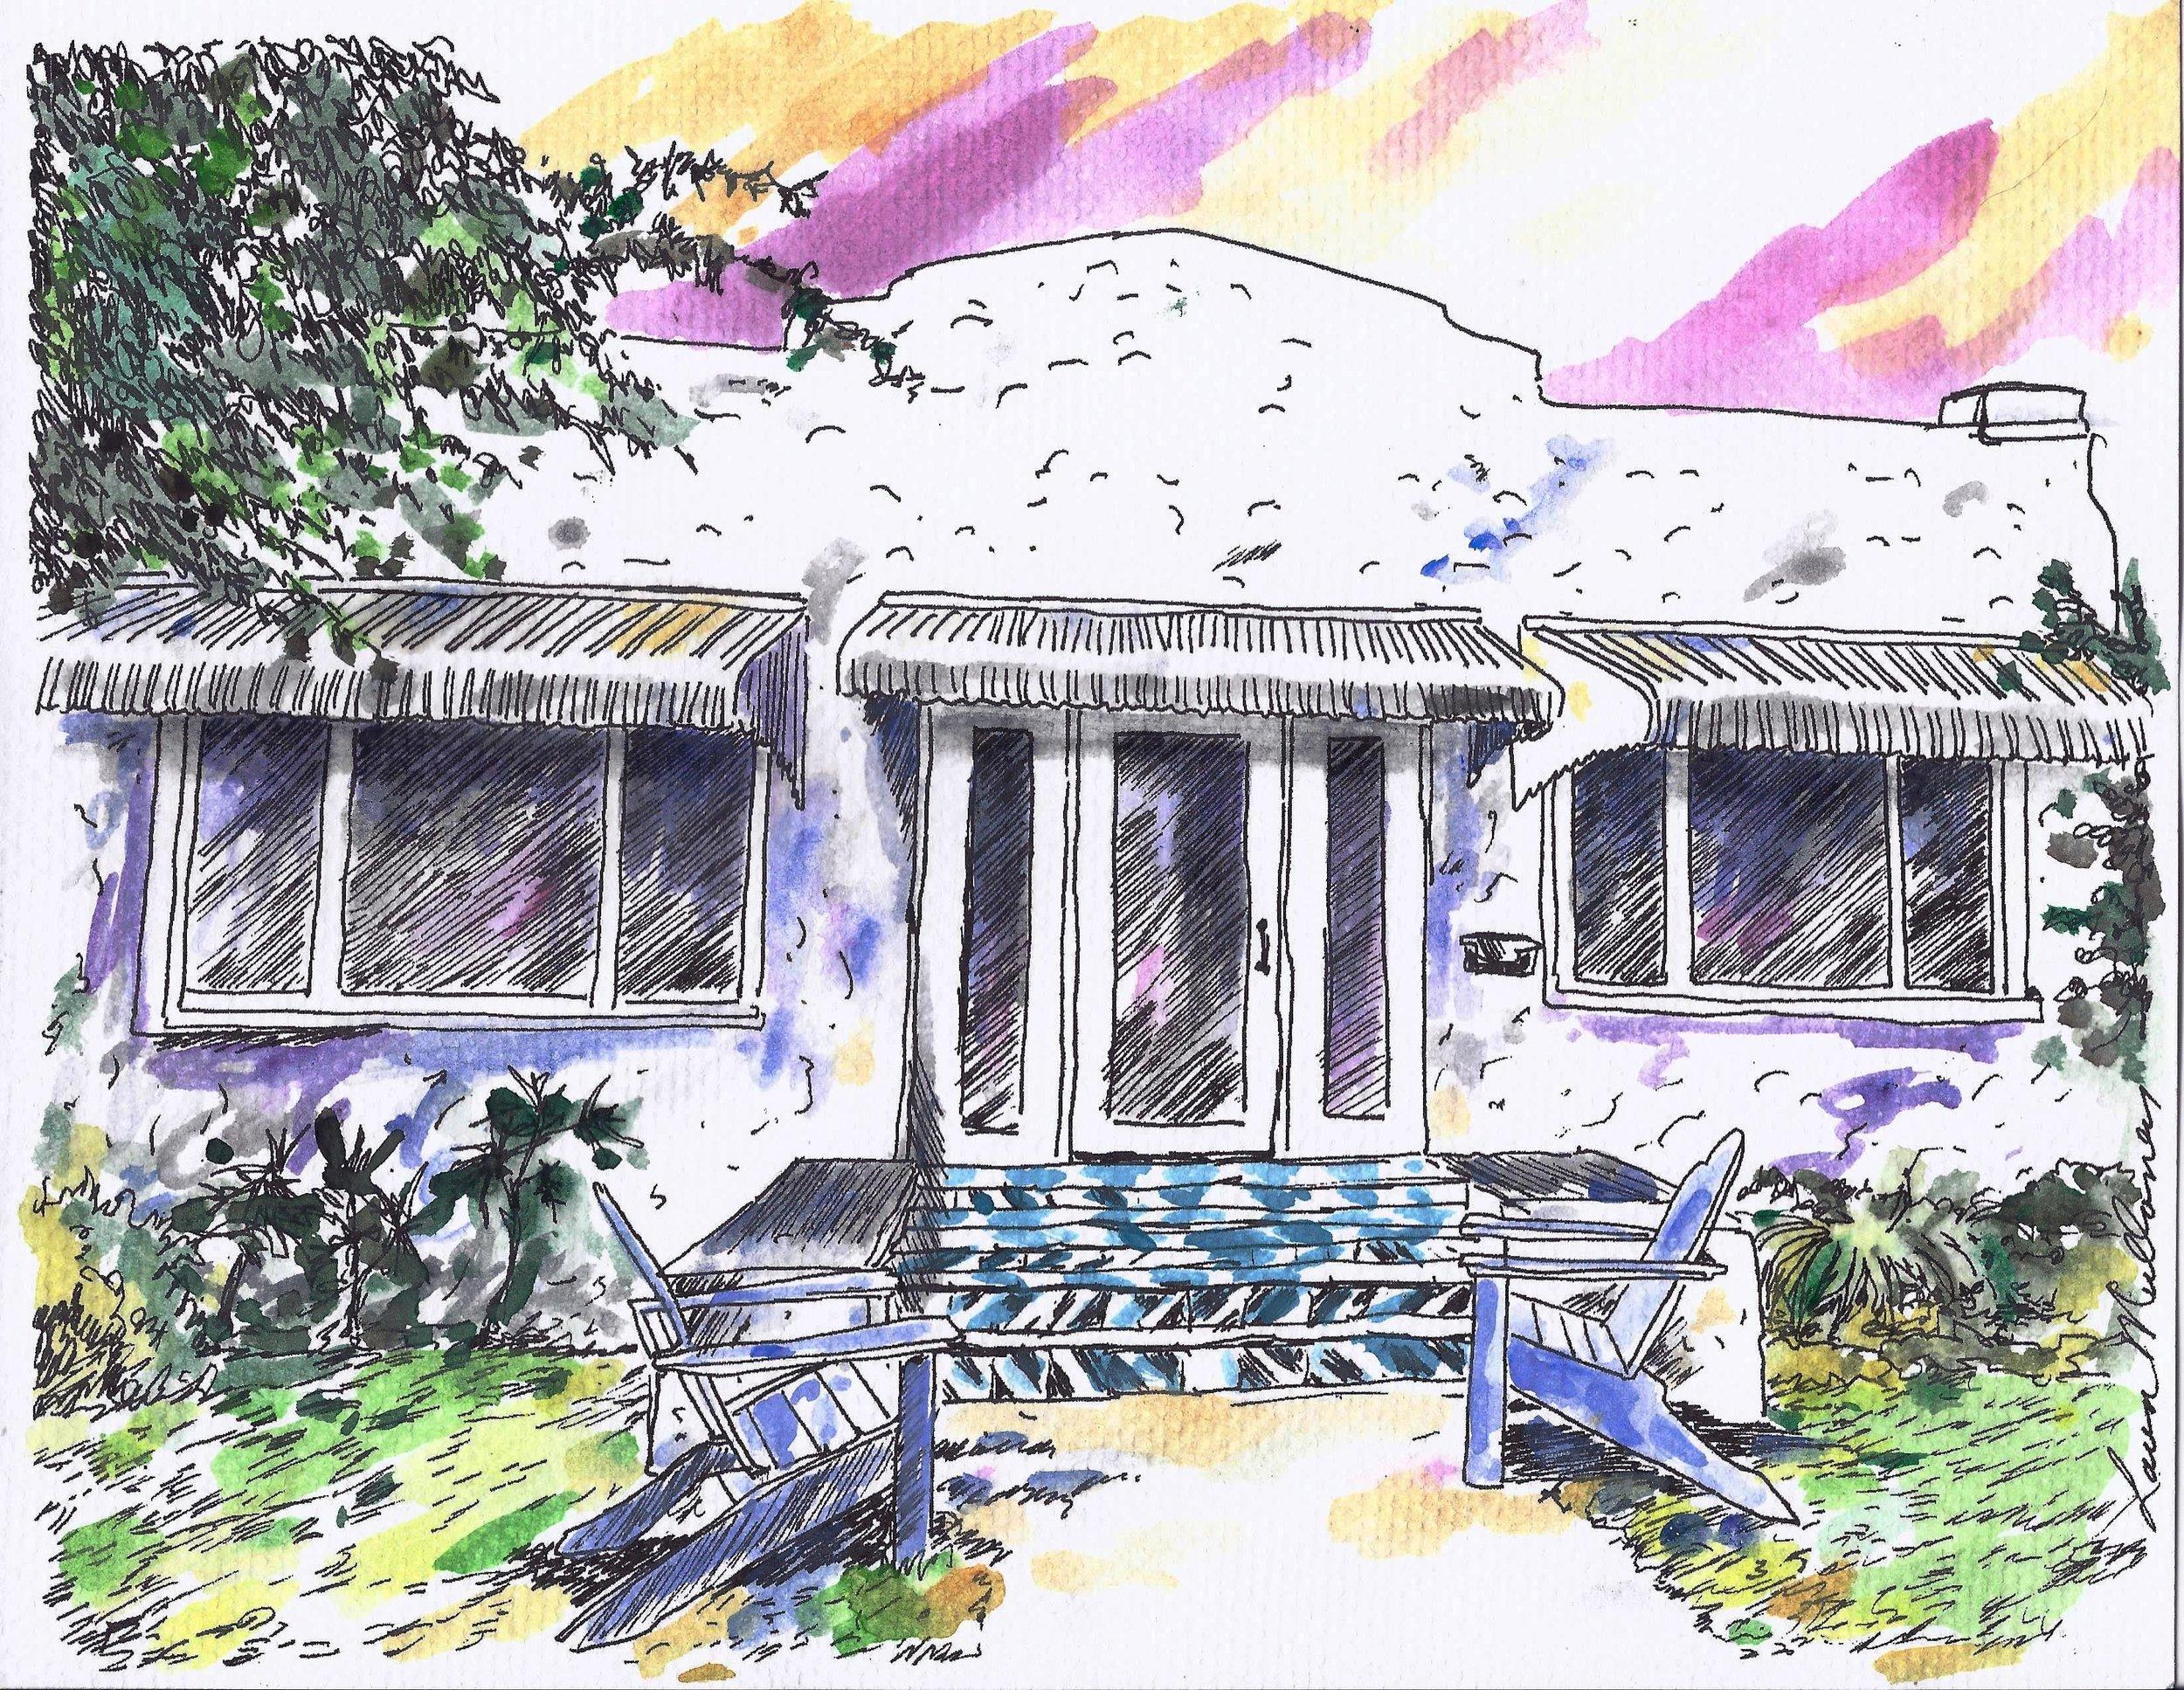 625 minorca avenue, coral gables